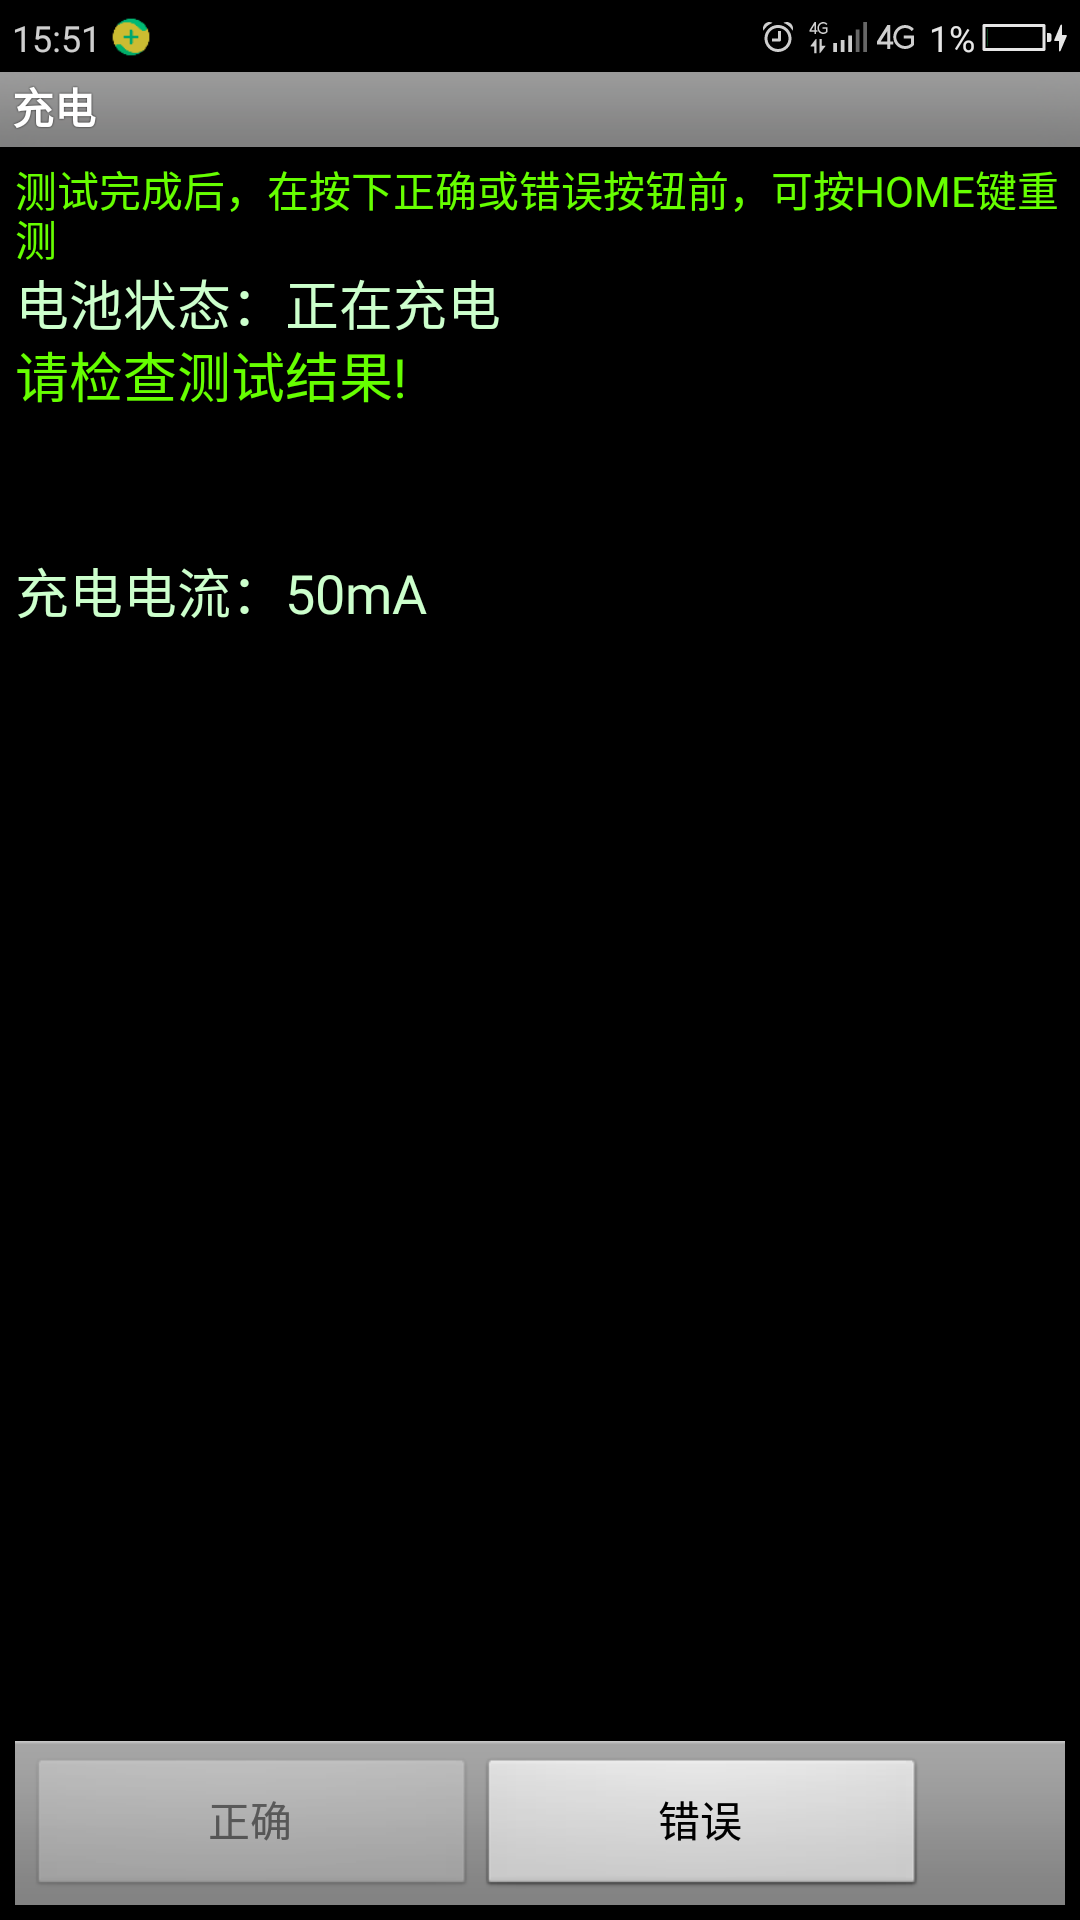 Screenshot_2017-12-13-15-51-48.png